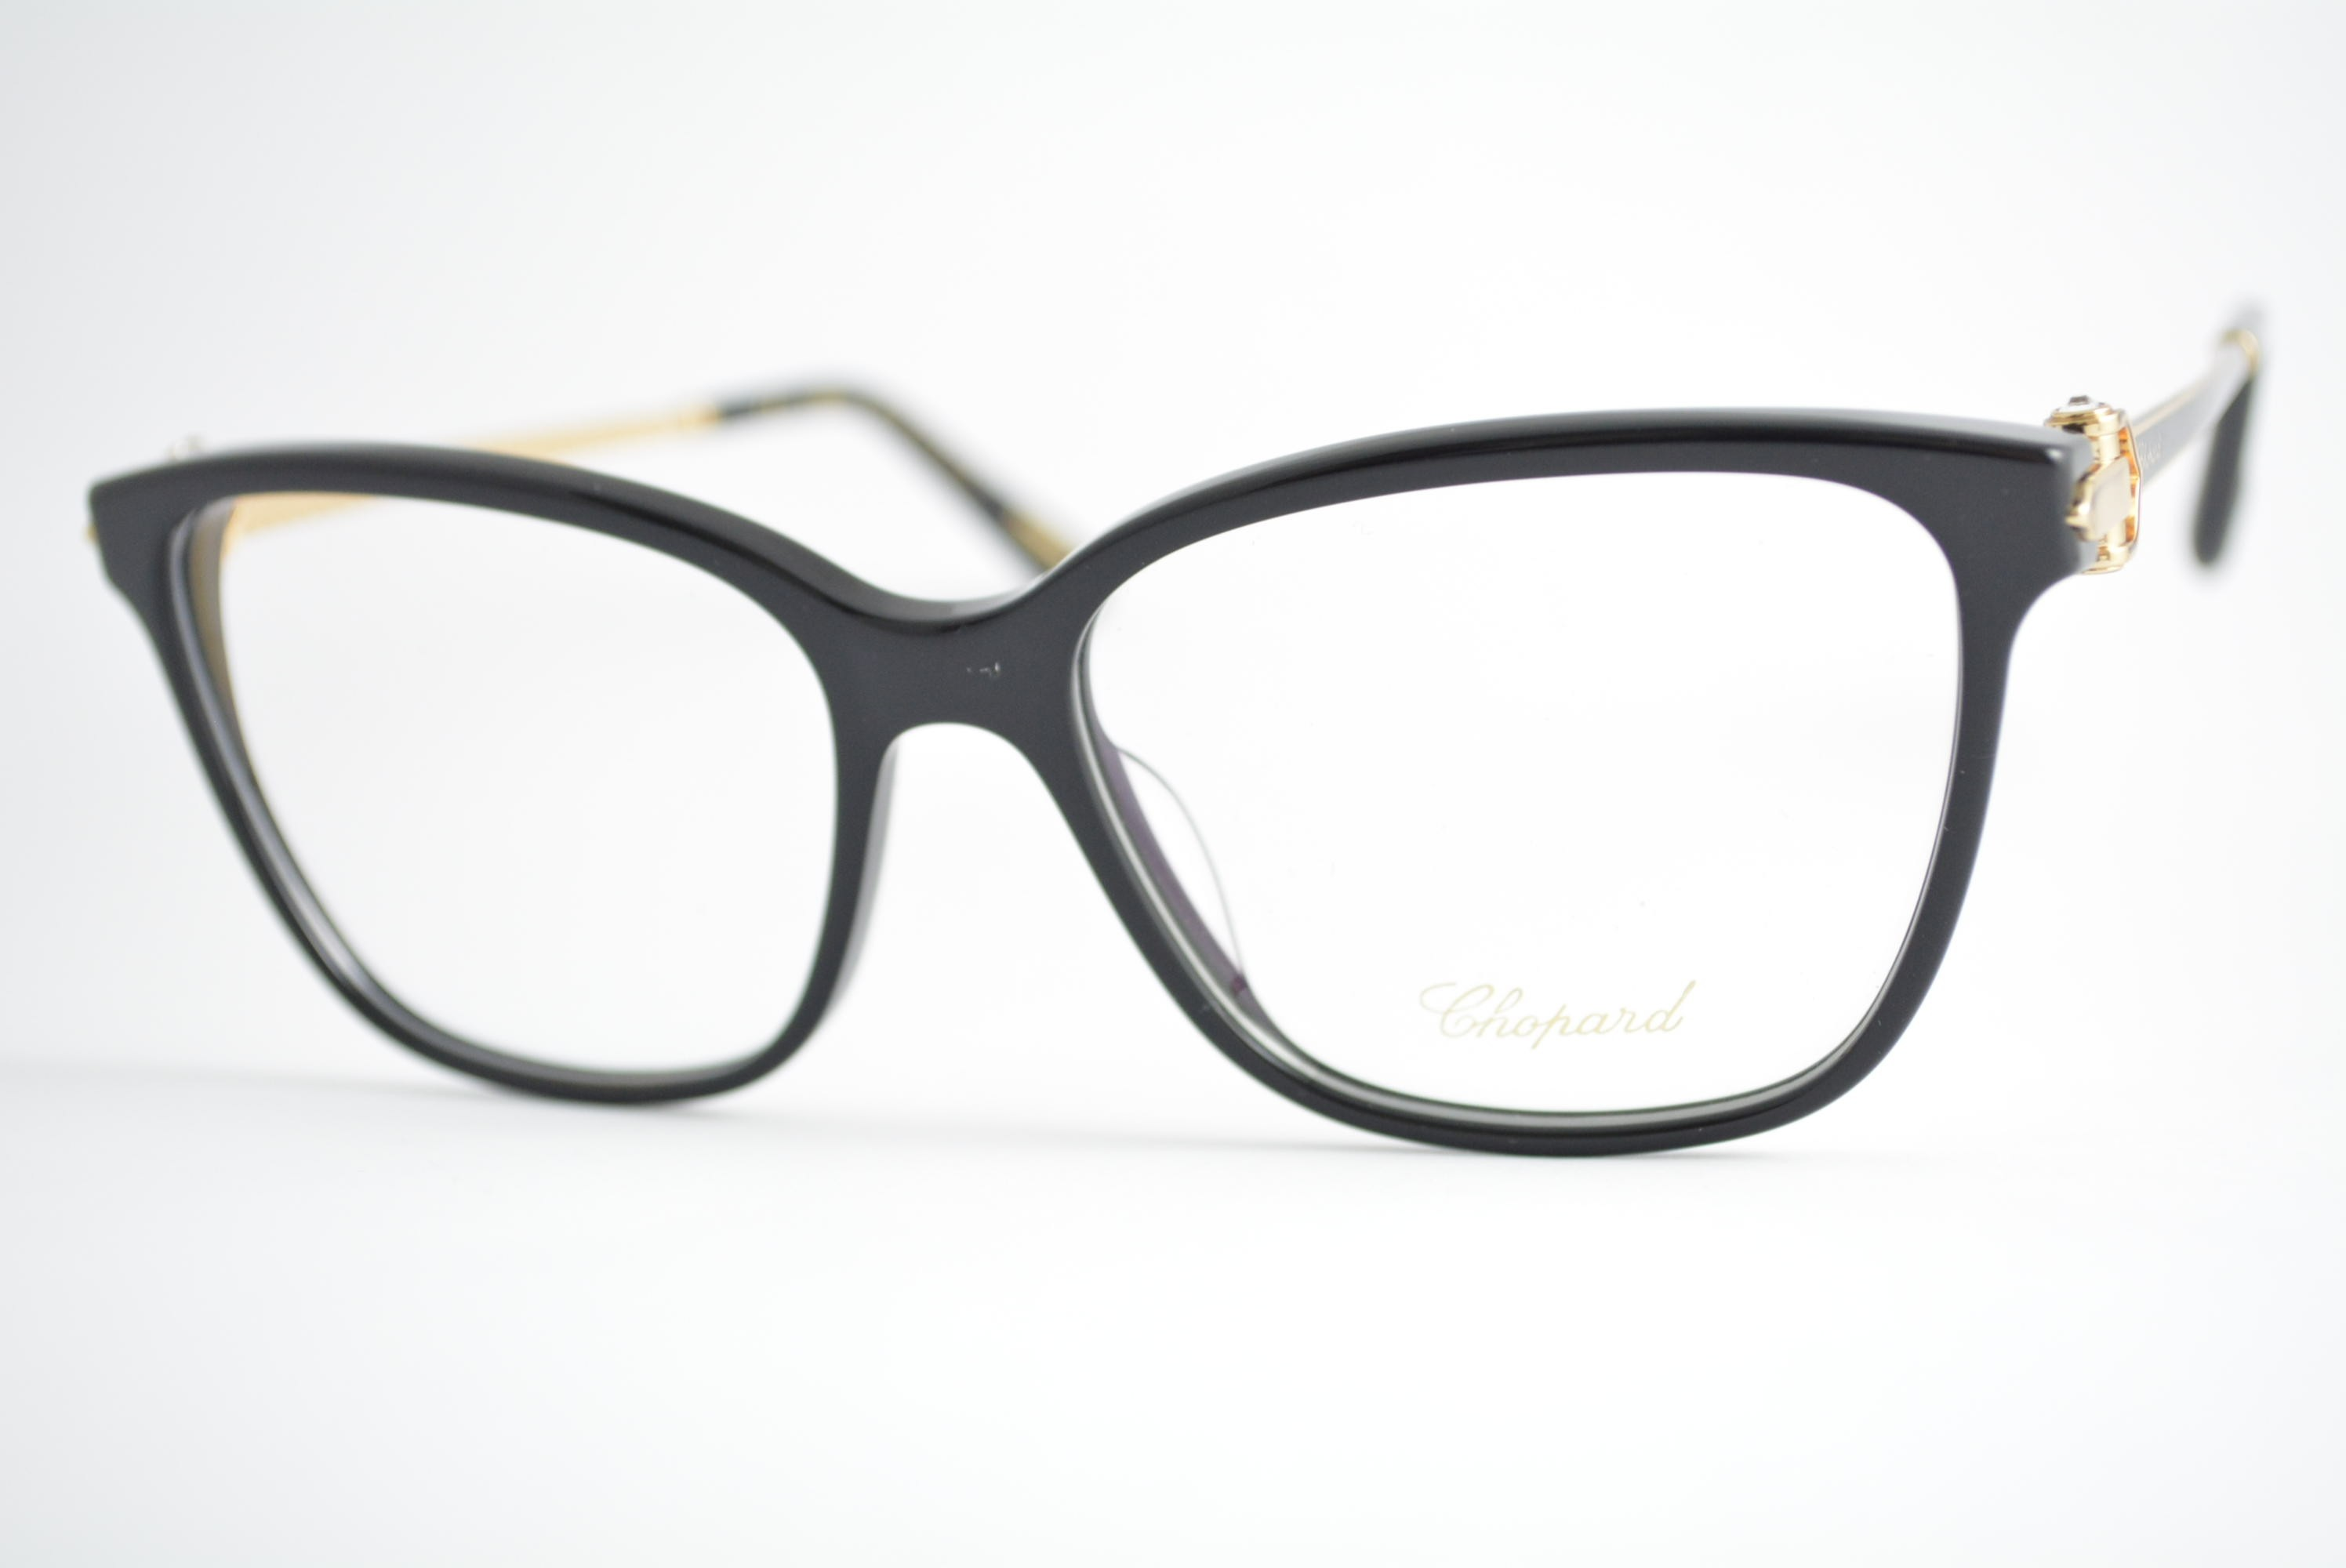 armação de óculos Chopard mod vch246s 0700